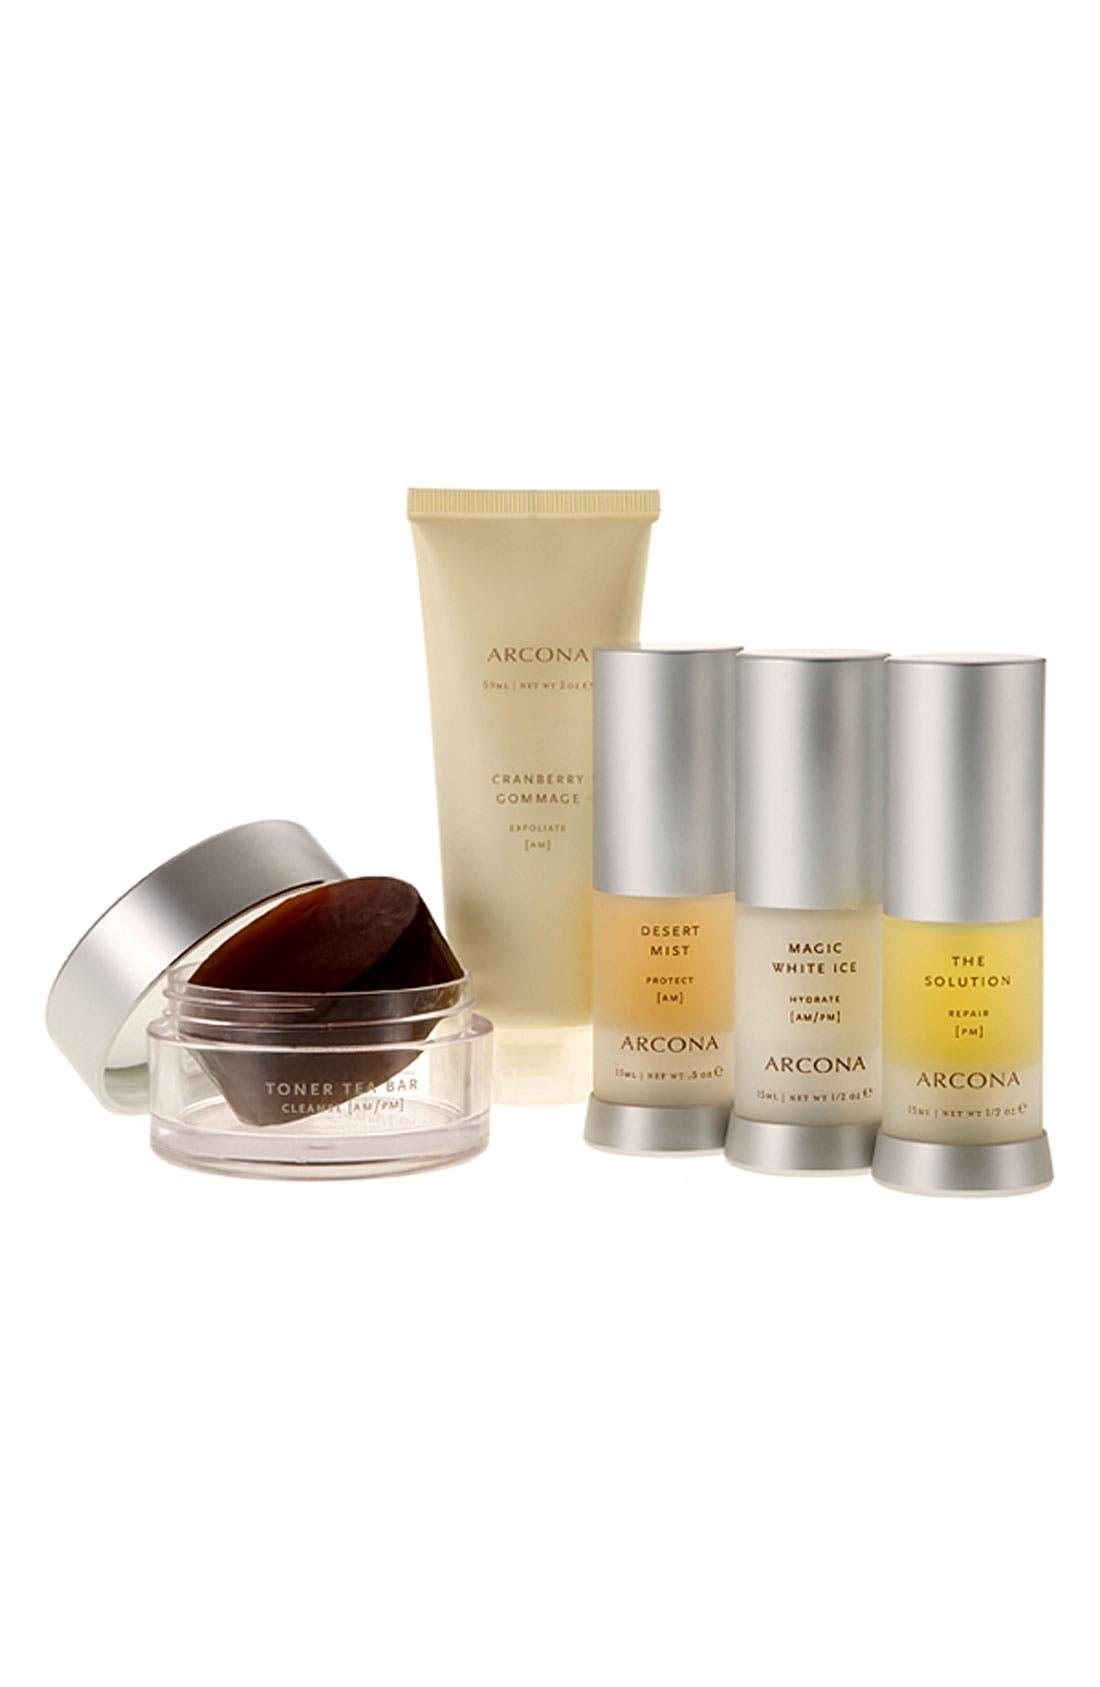 Main Image - ARCONA 'Basic Five' Travel Kit for Oily Skin ($102 Value)